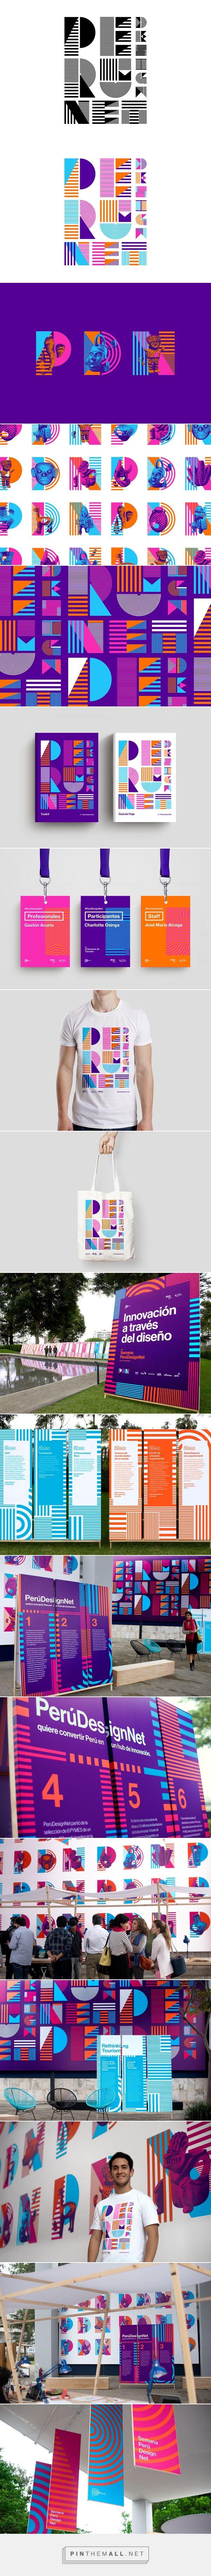 Peru Design Net on Behance